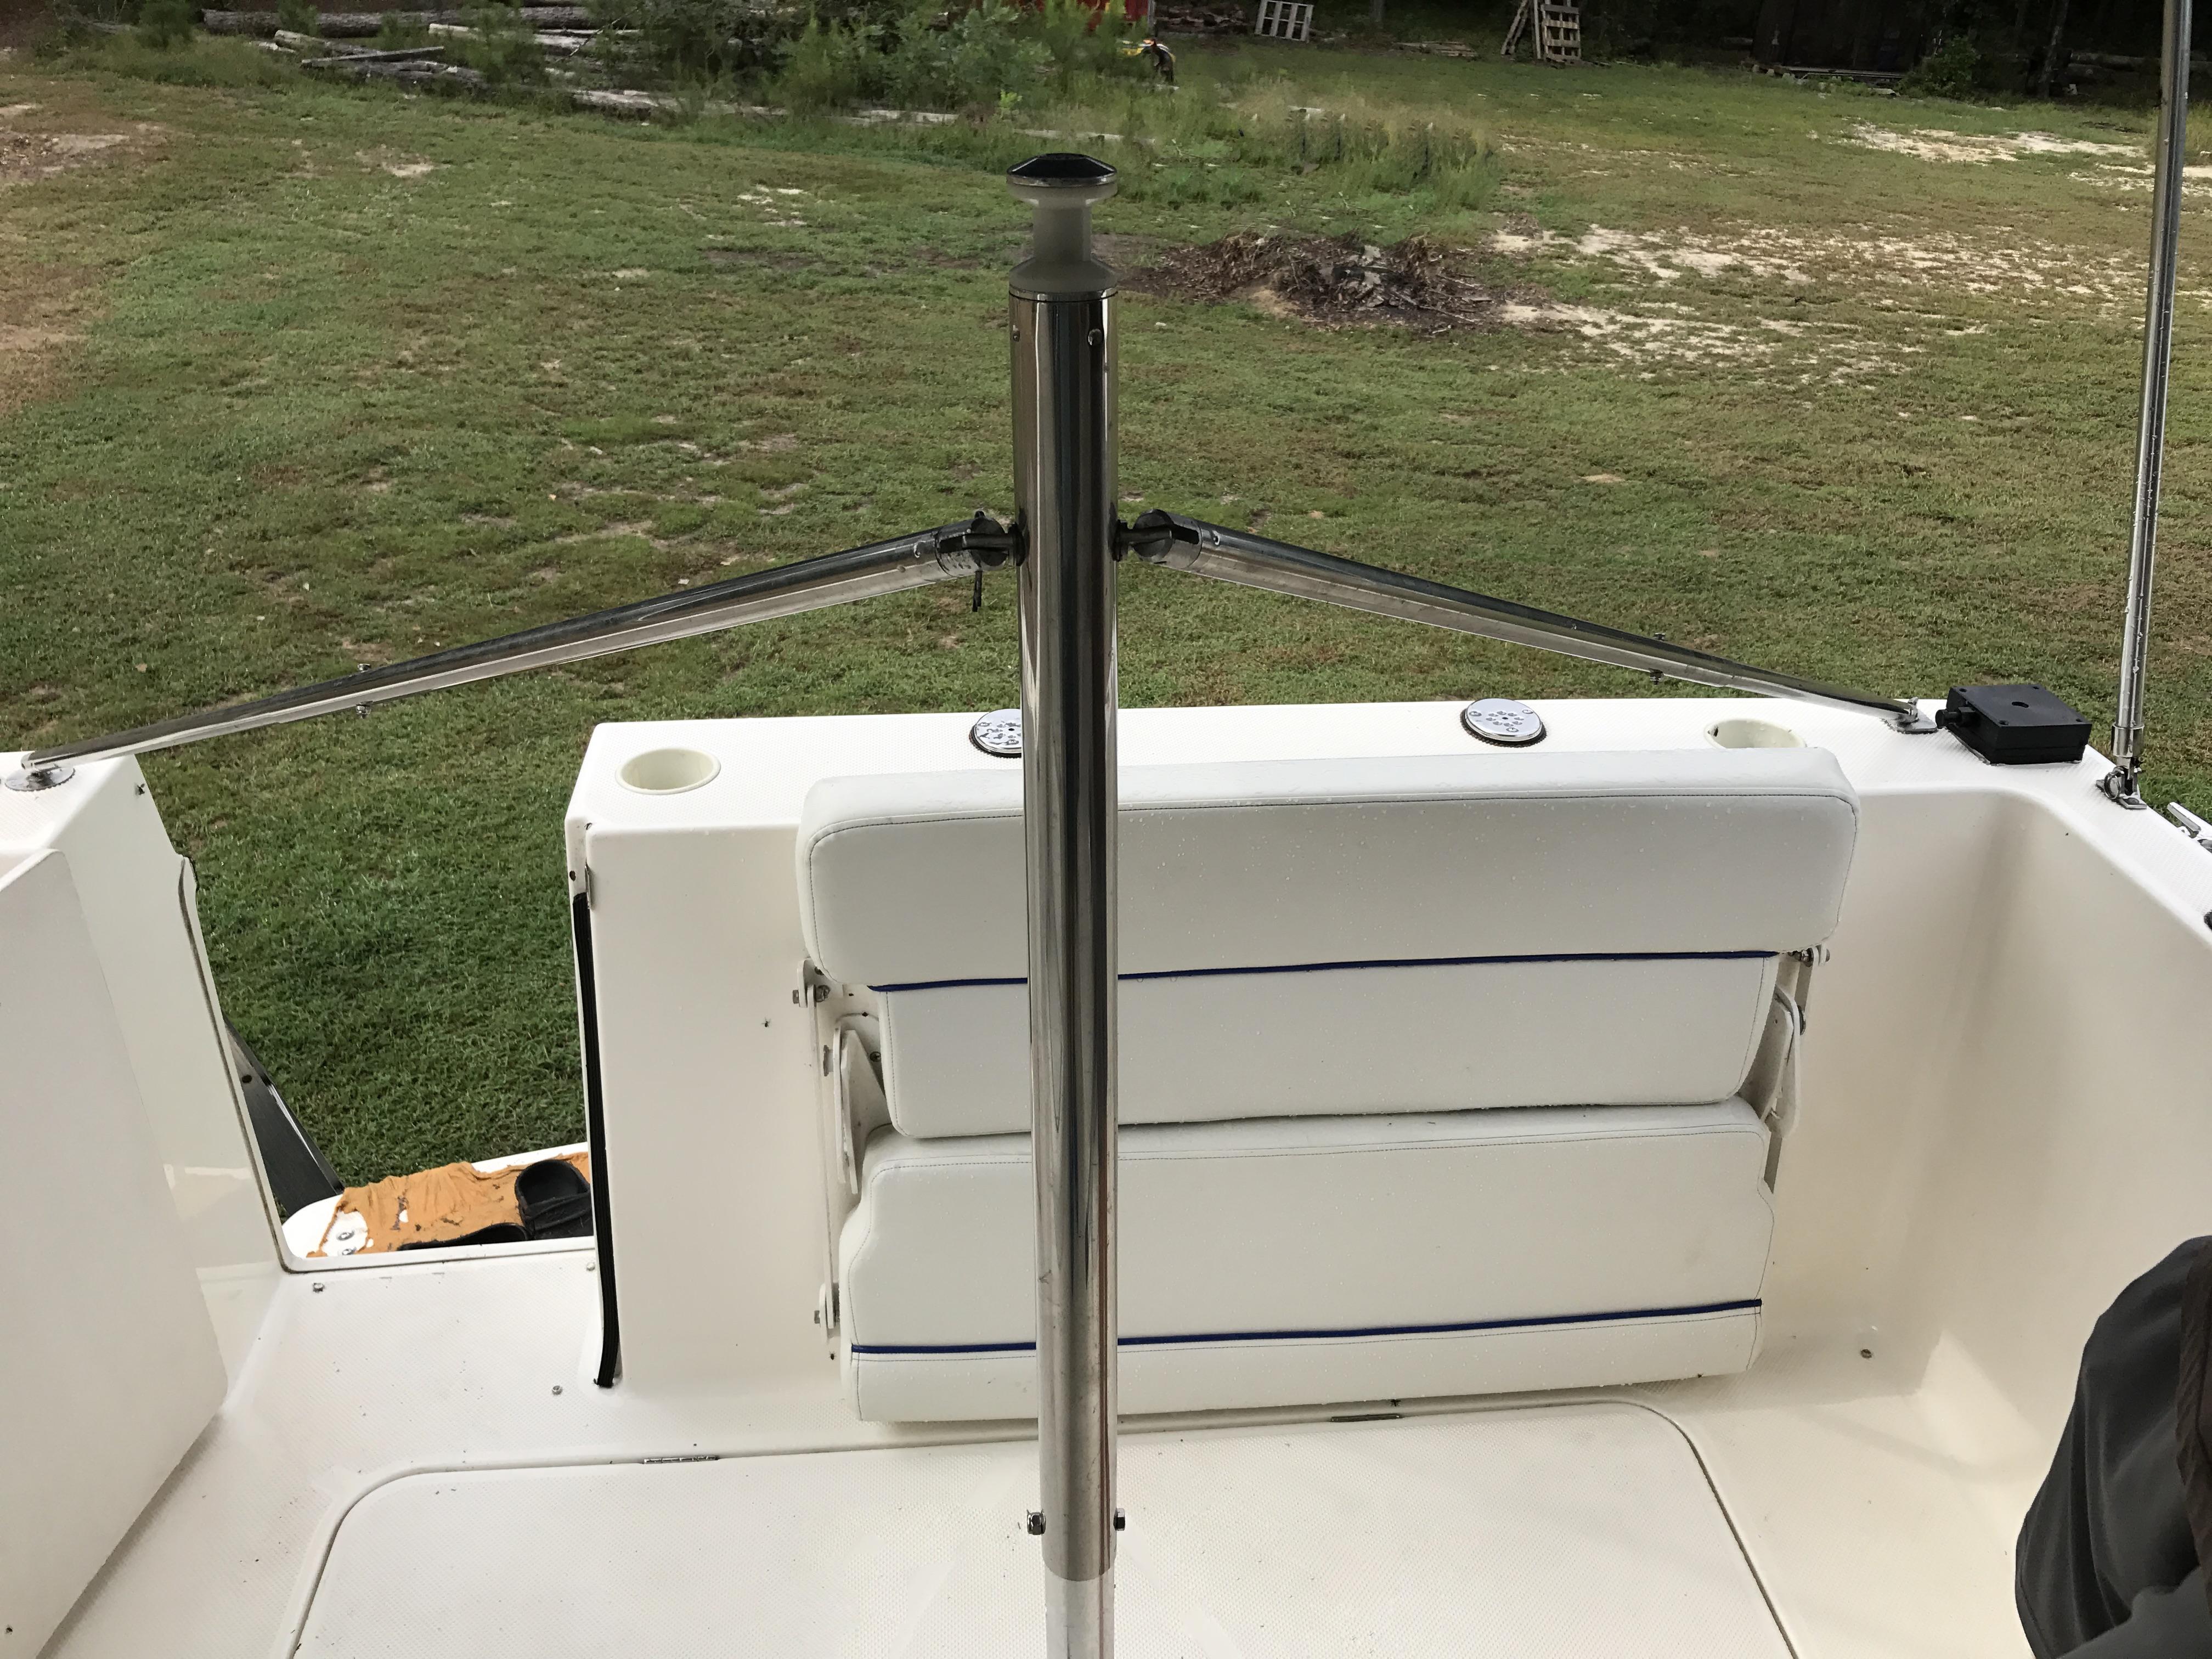 Bayliner Discovery 246 EC - Includes custom ski/tube tow bar